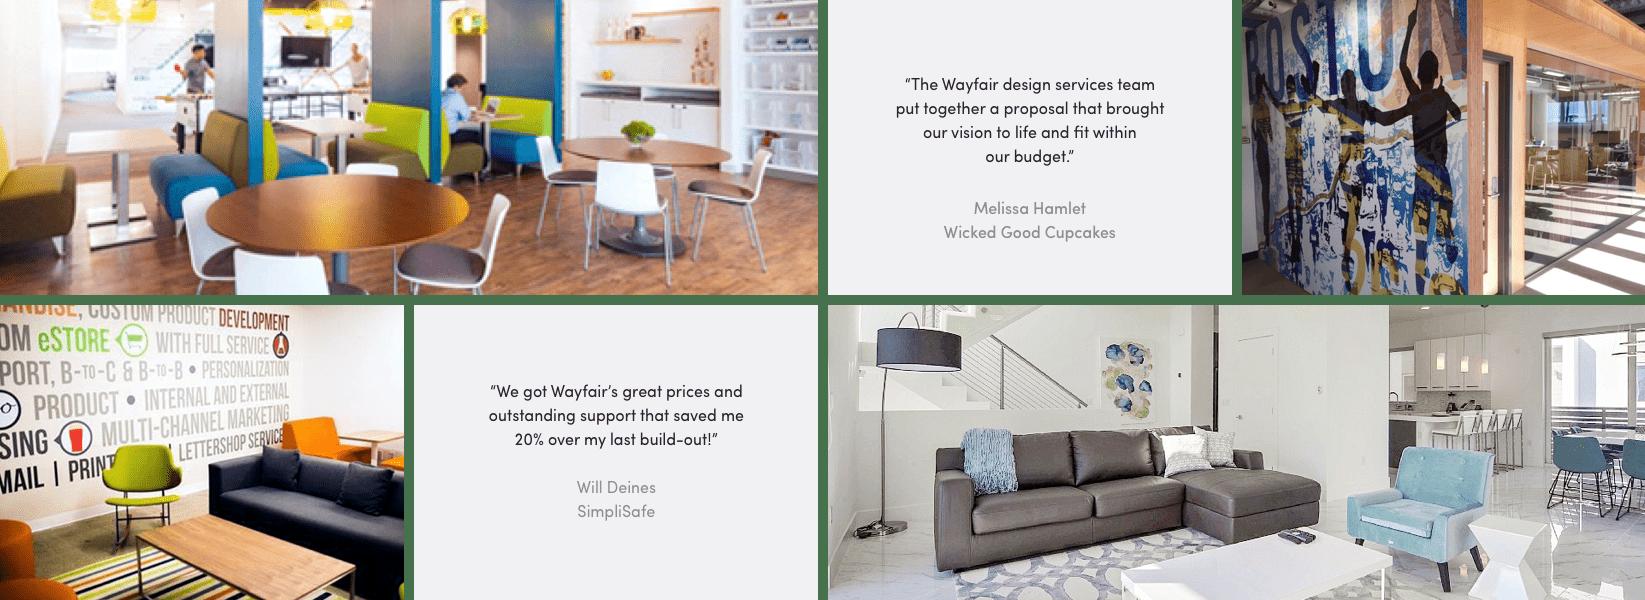 Business Interiors customer quotes